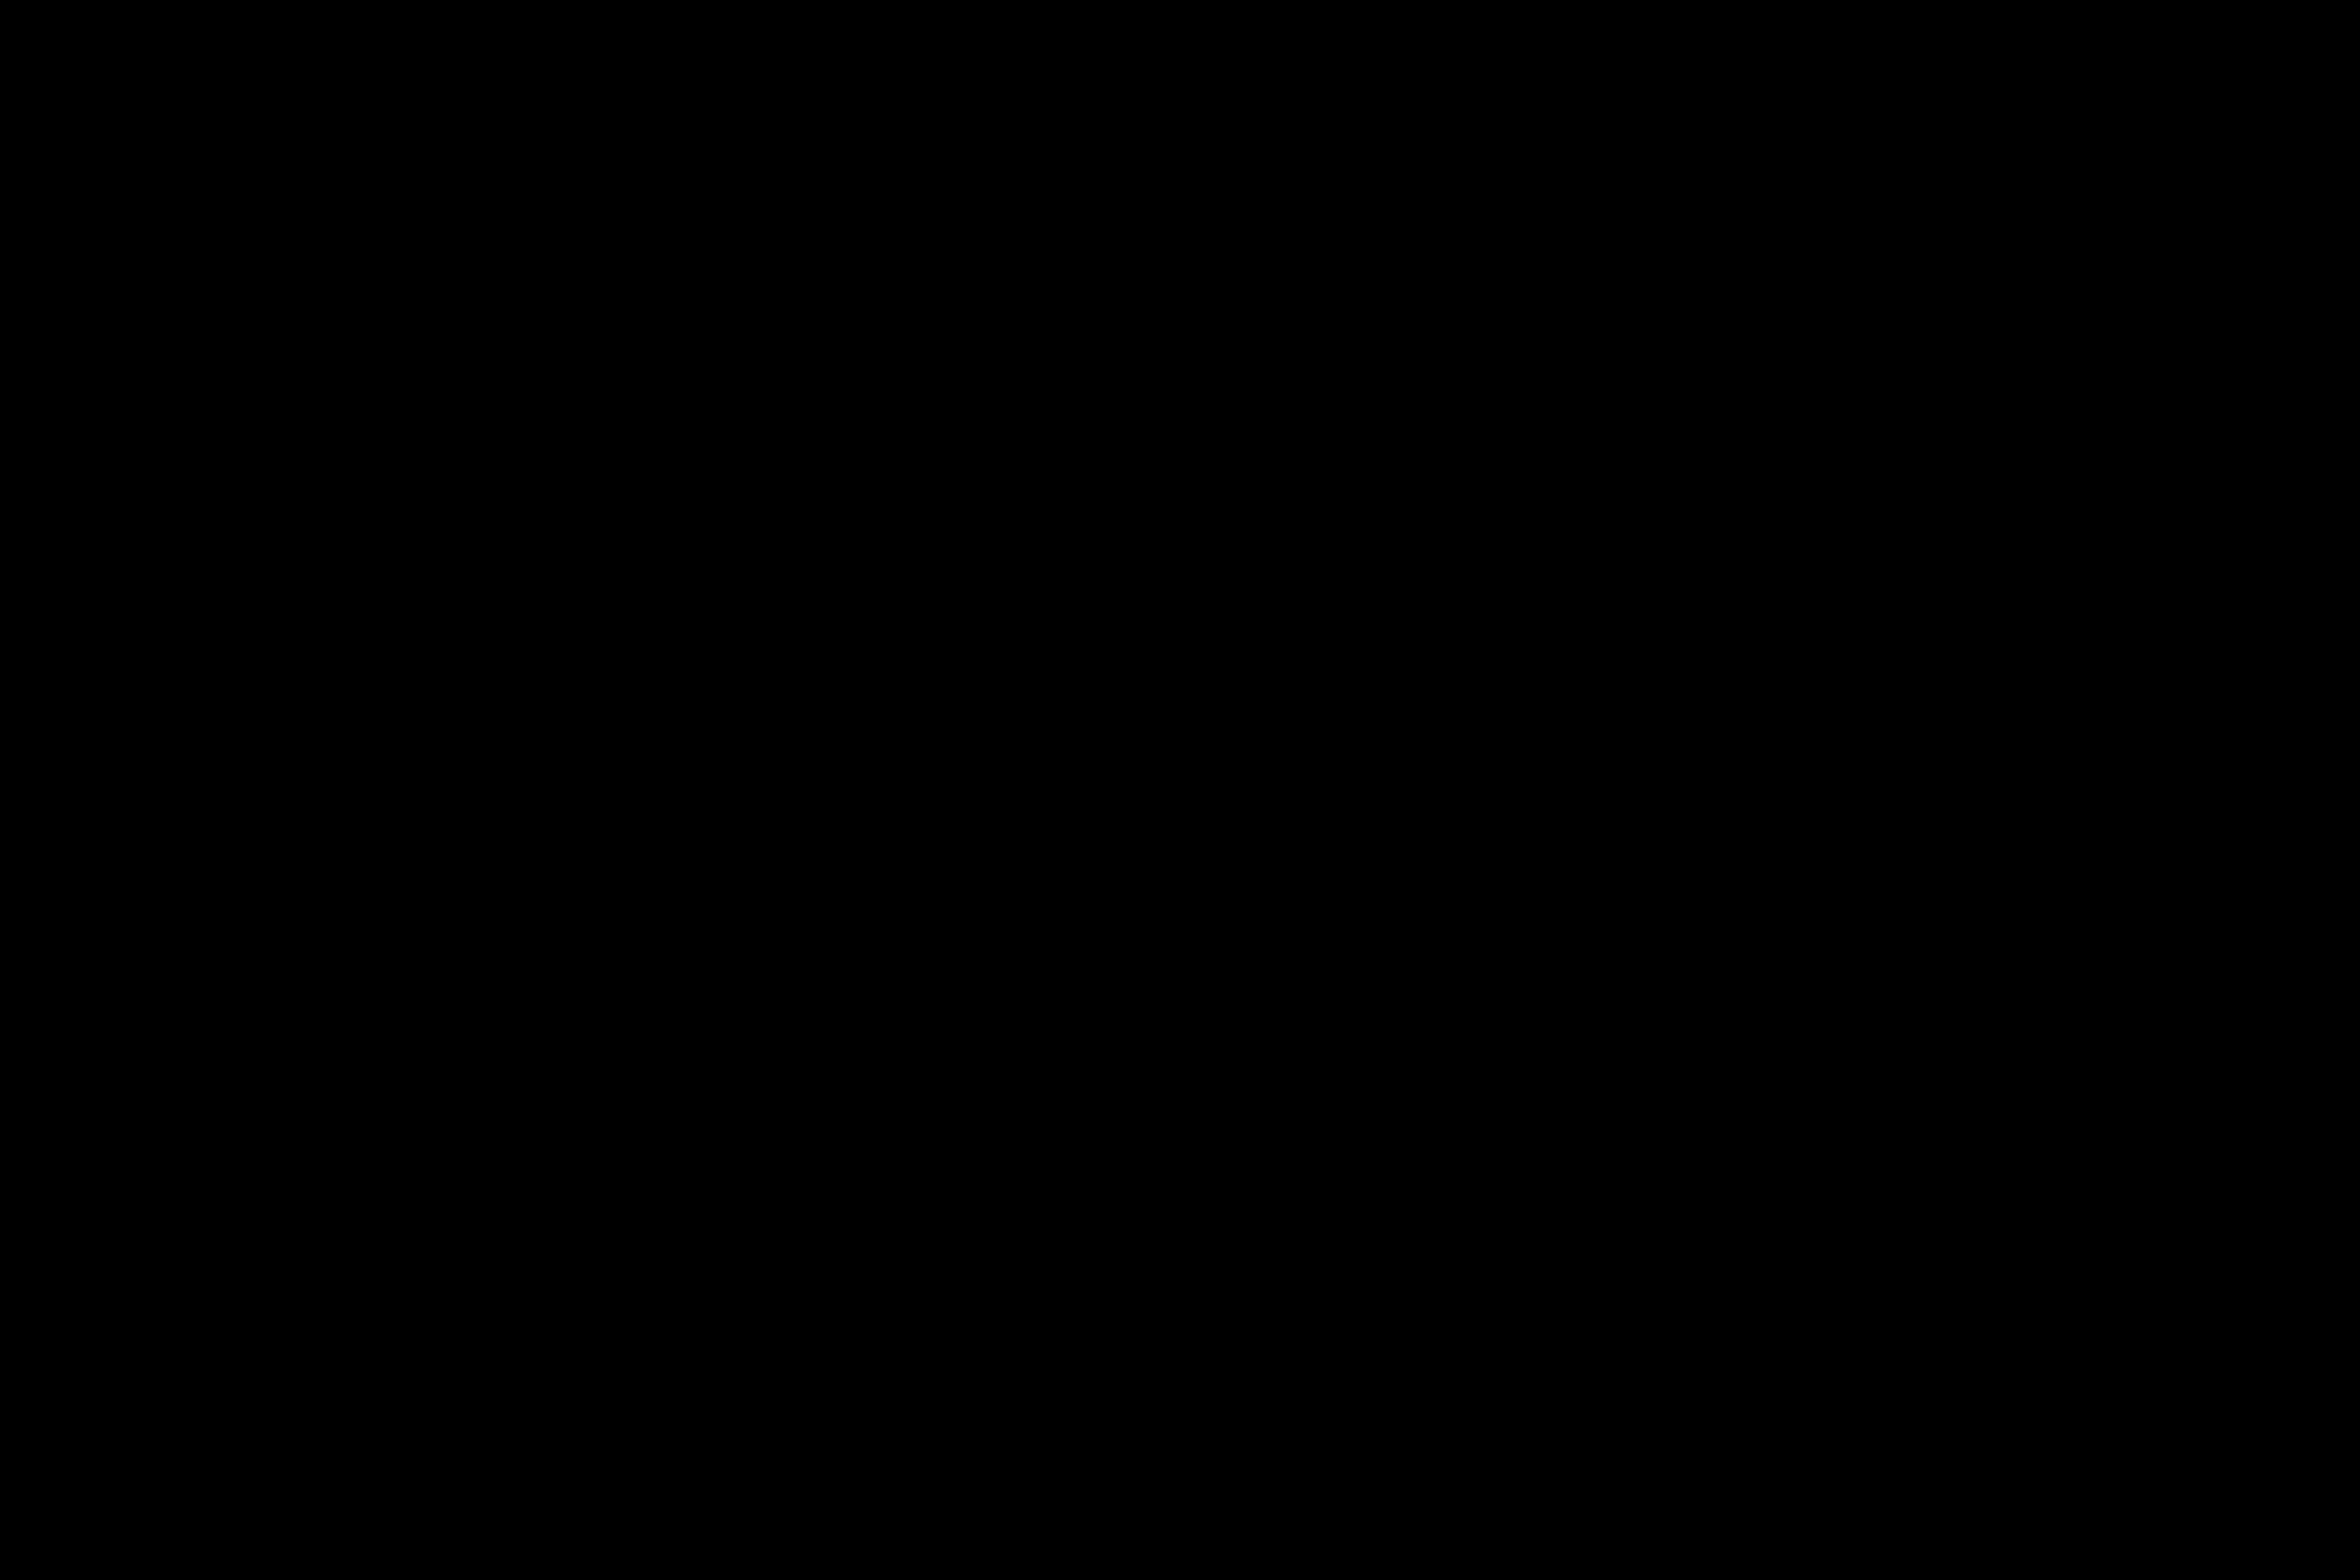 Jochem-Herremans-black-hiRes-zonder.png